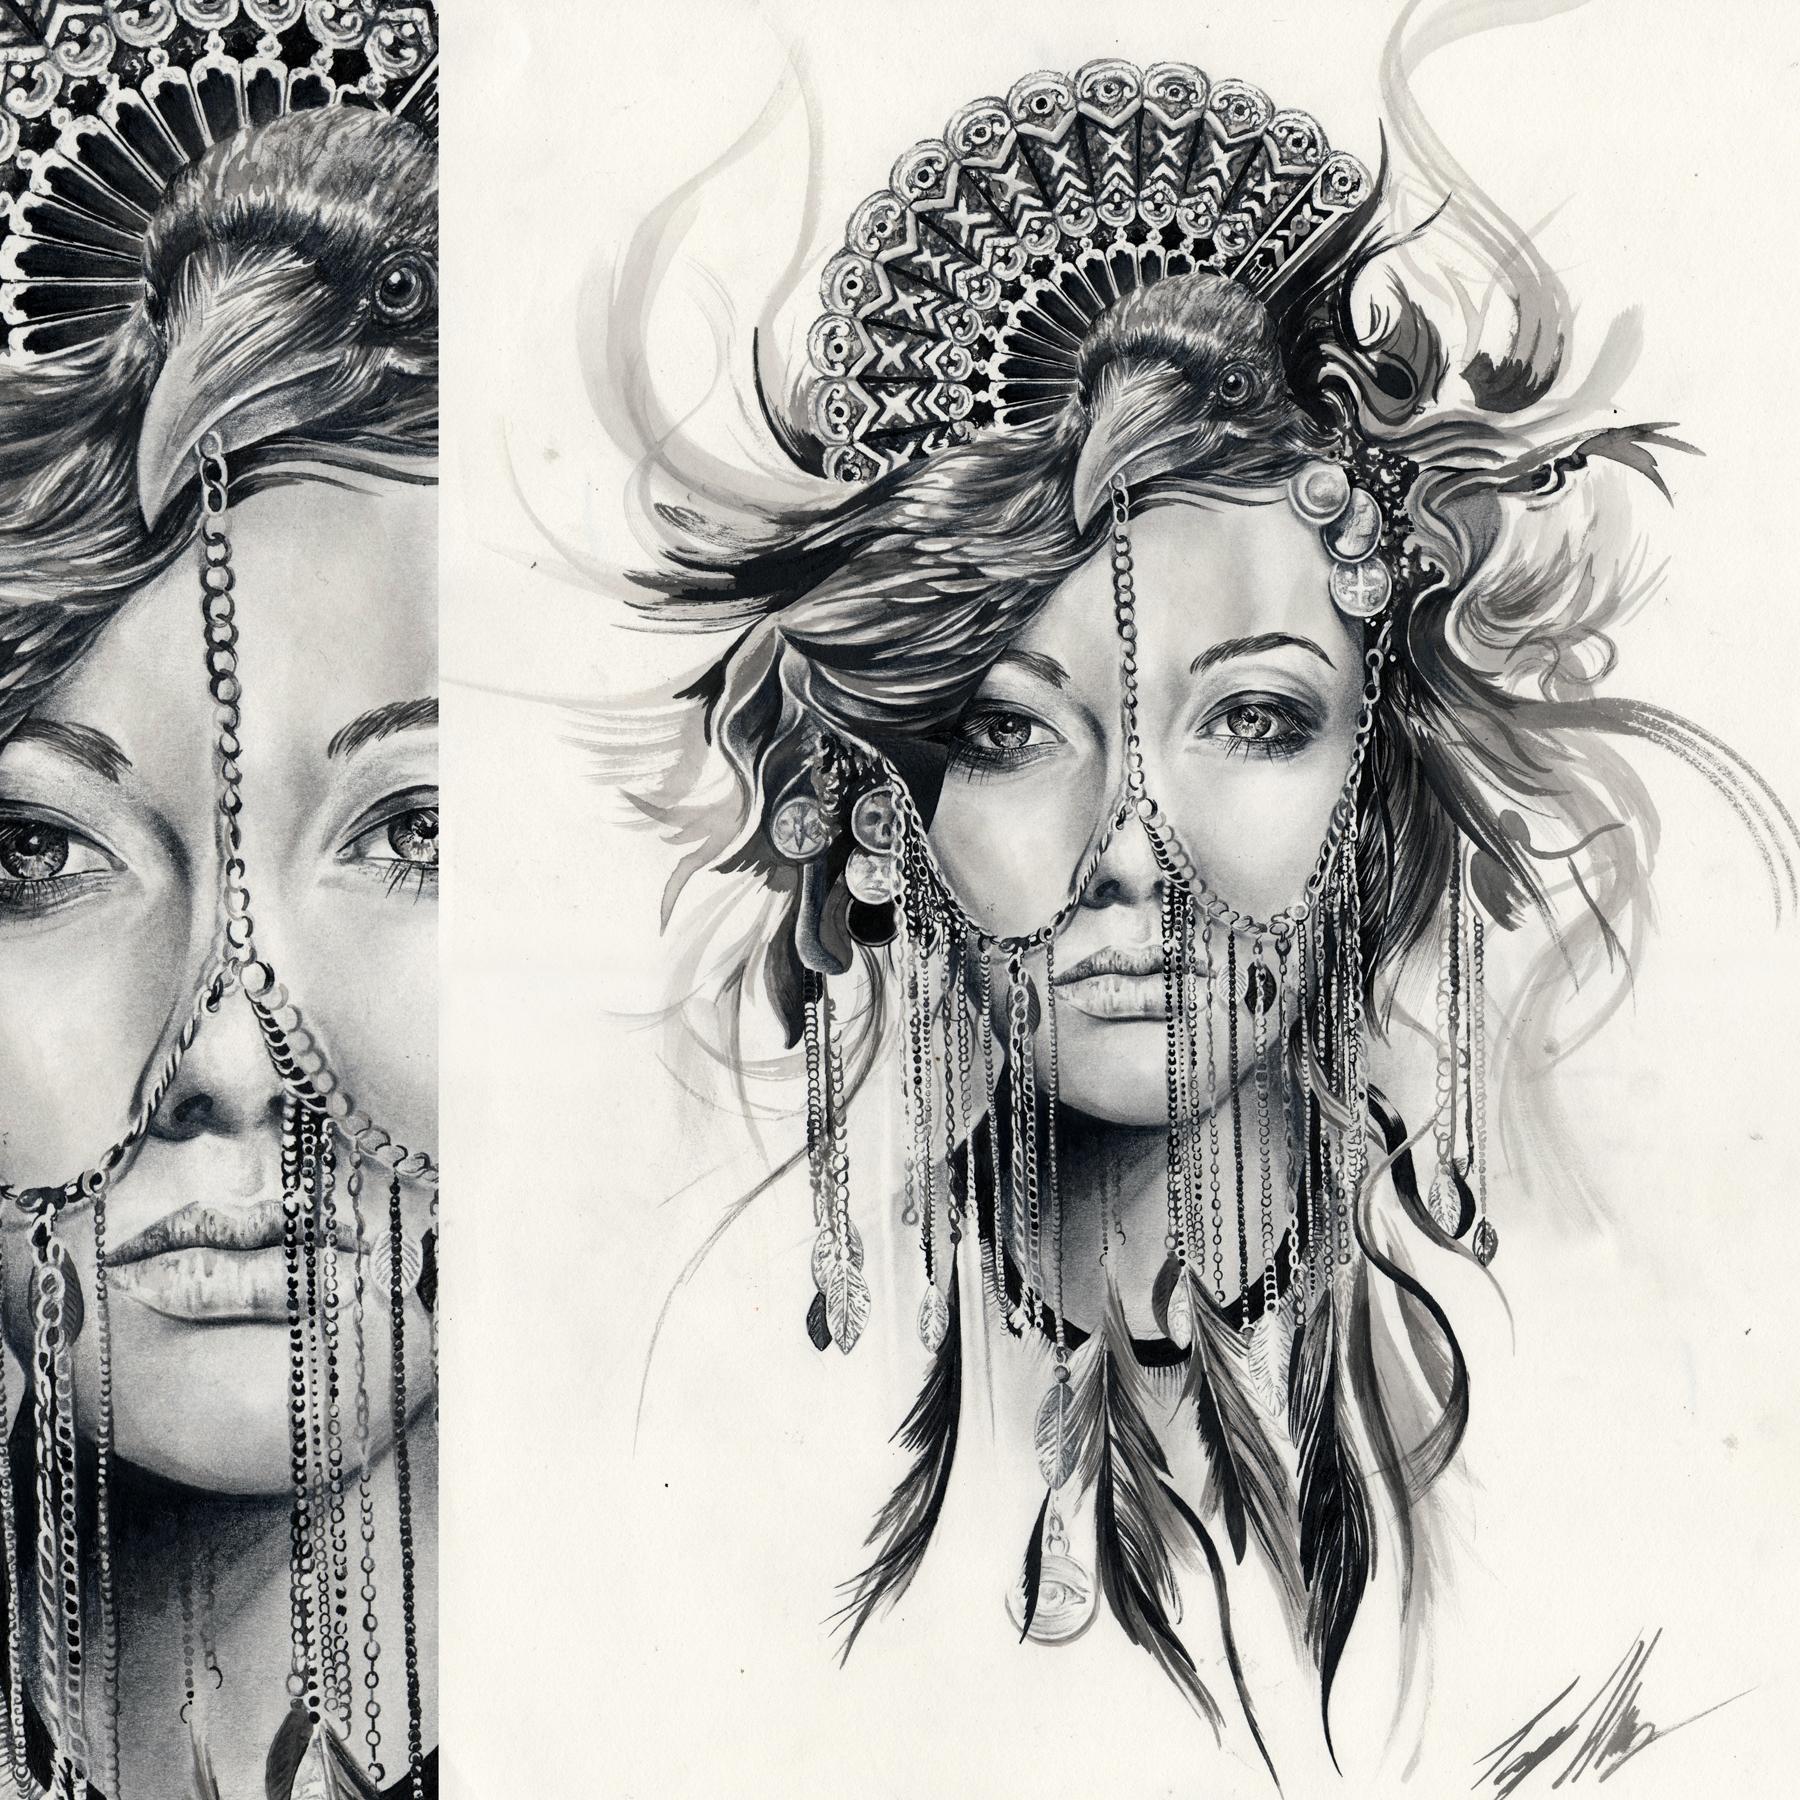 Drawn raven wicked #feathers Artwork #raven #graphite #graphite